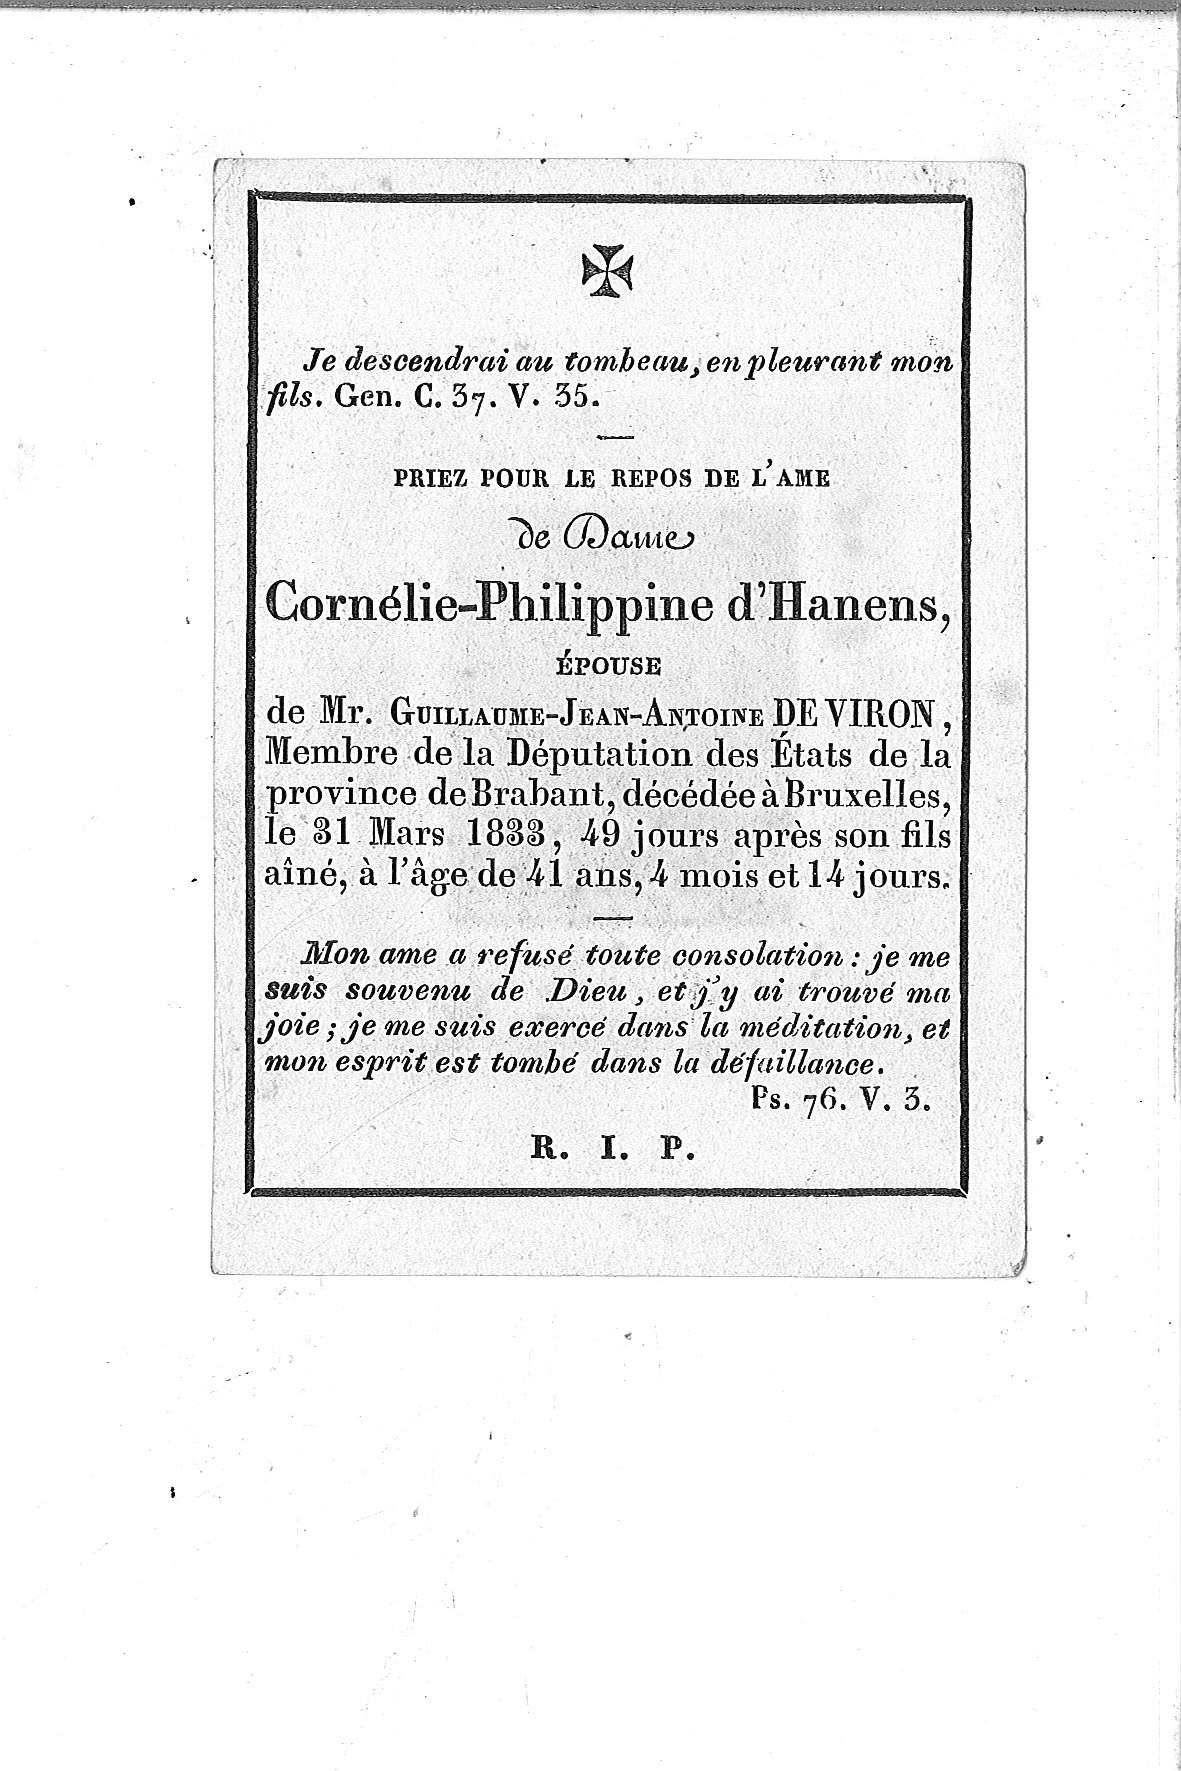 Cornélie-Philippine-(1833)-20120919084524_00025.jpg